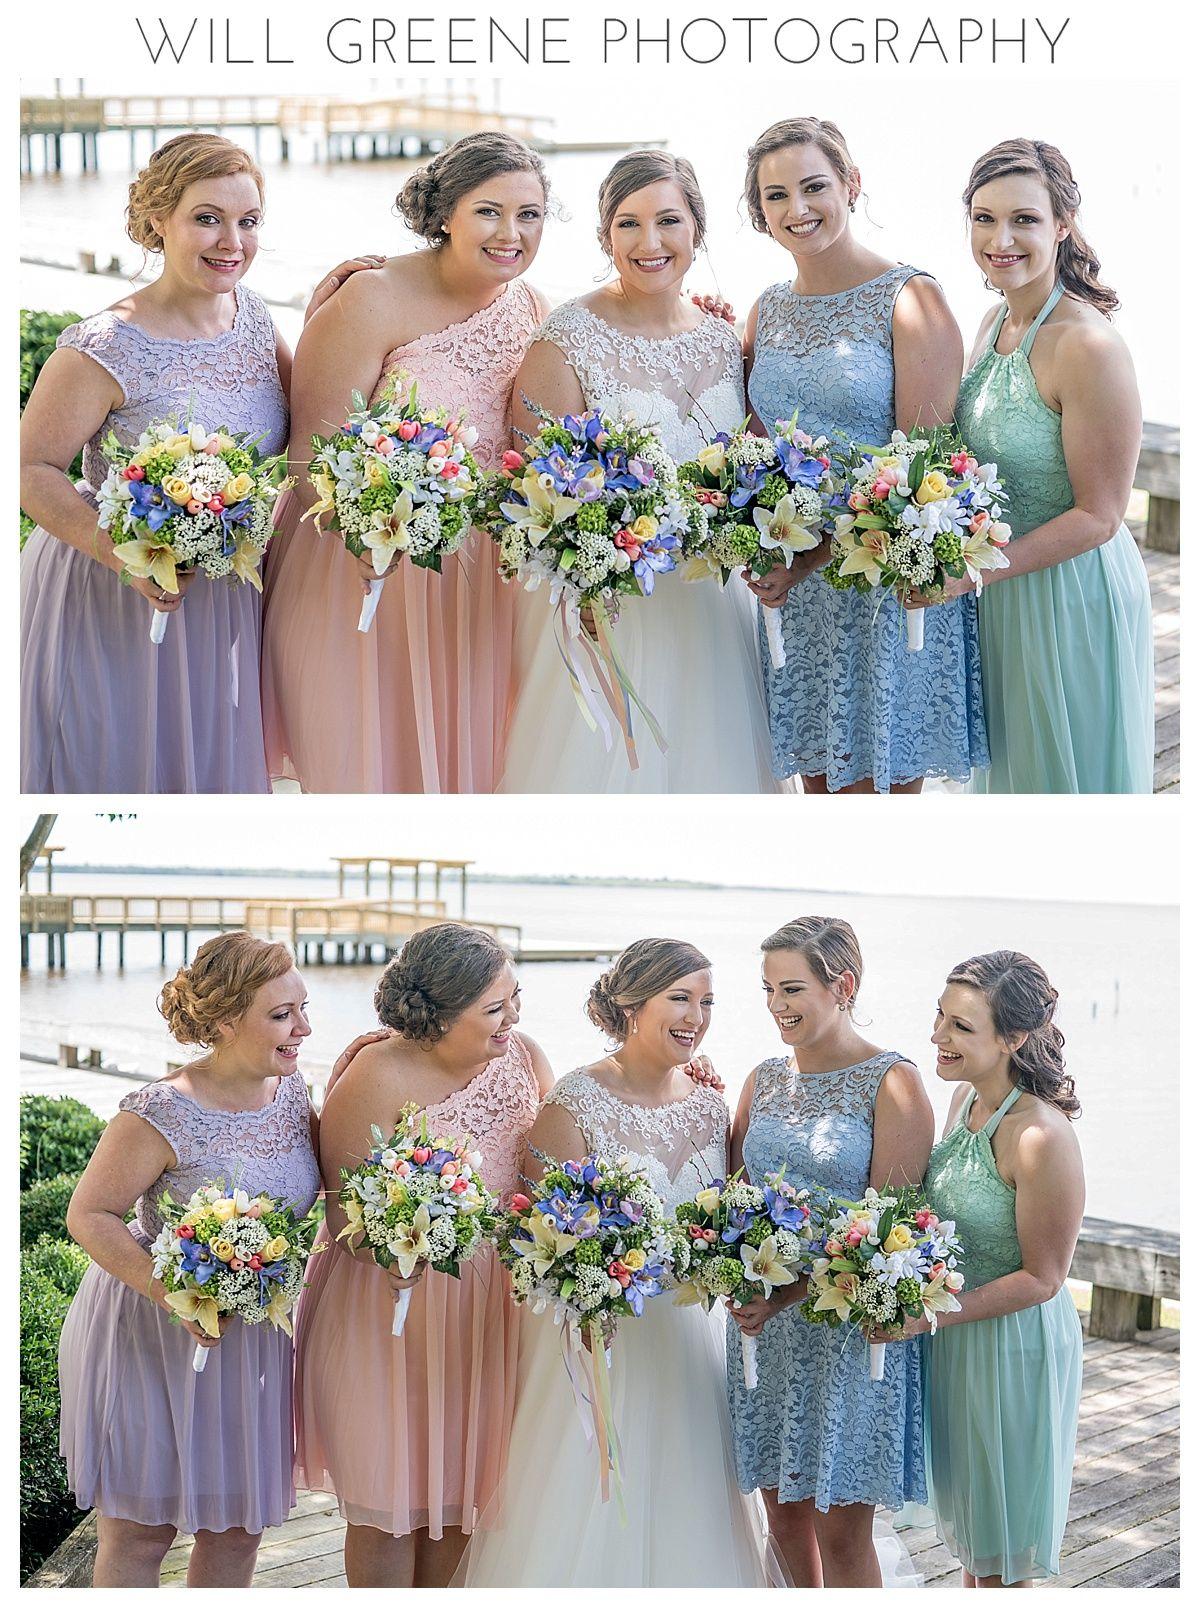 Hannah u justynus eastern h center wedding day columbia nc will